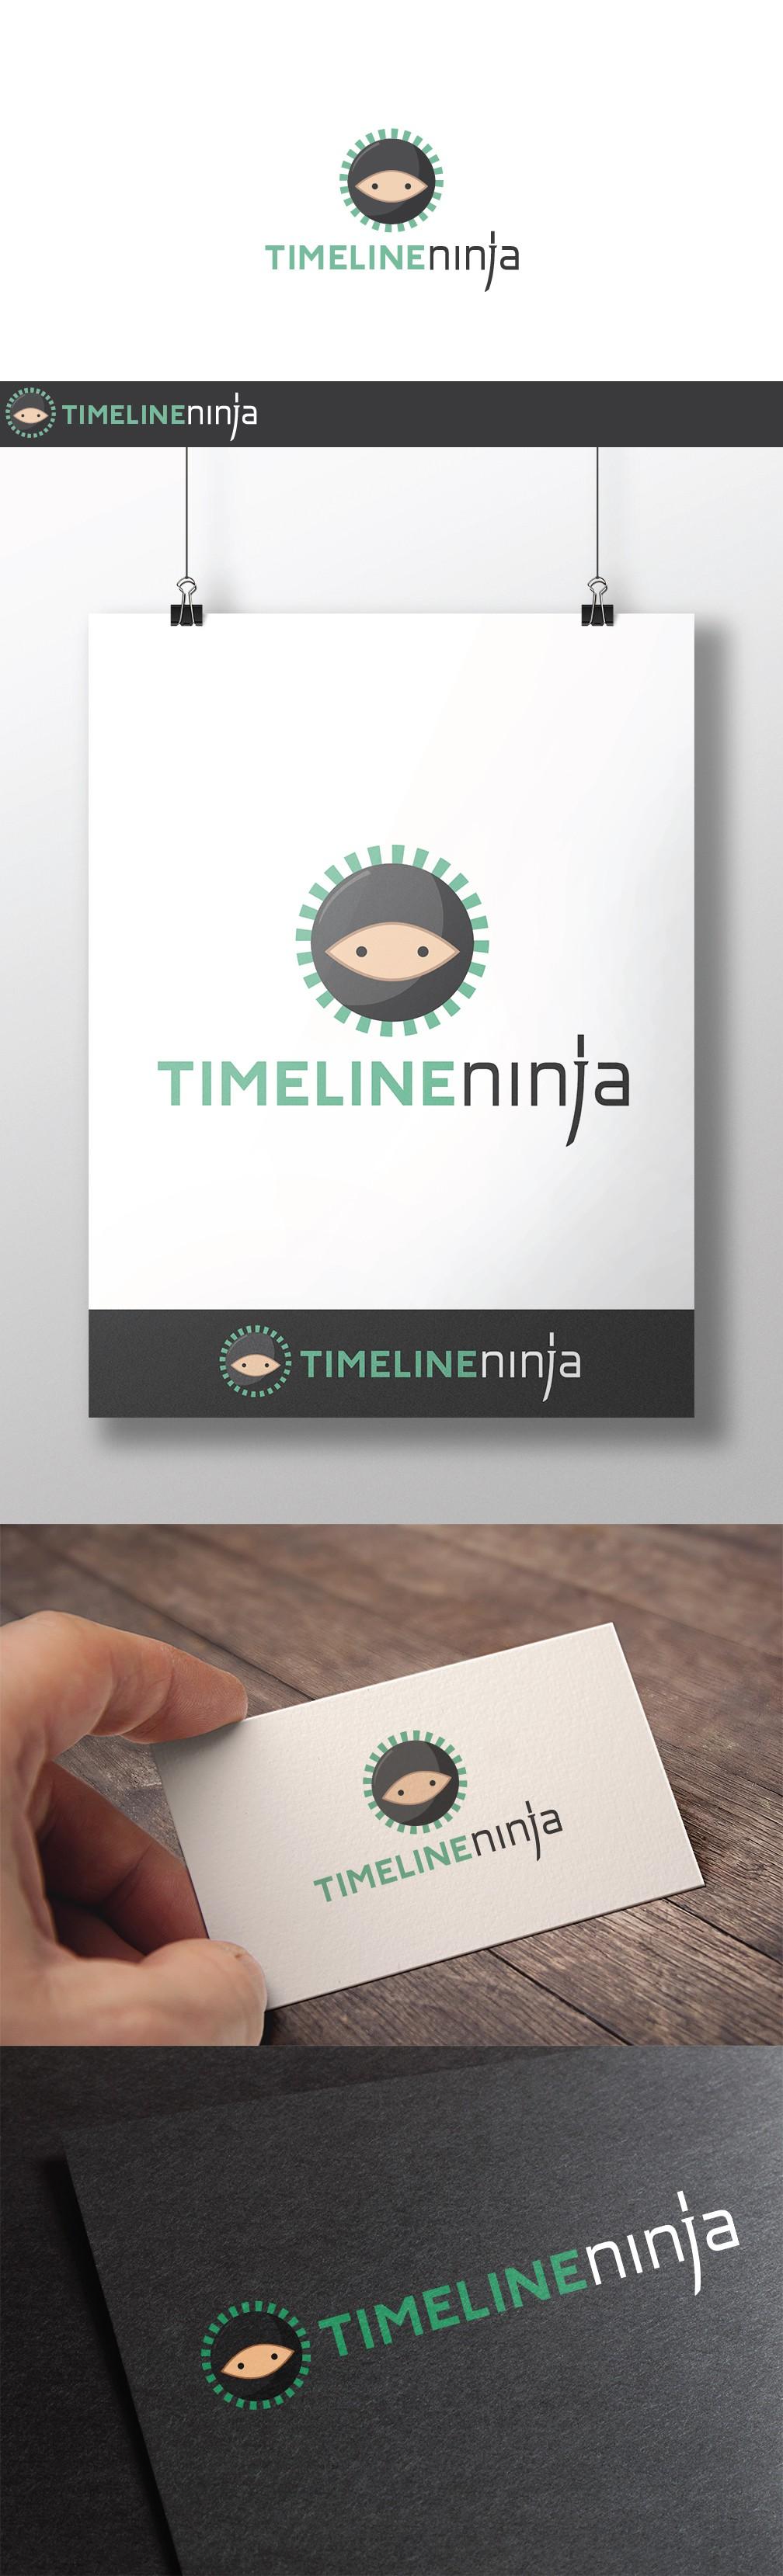 Logo for new data visualization startup